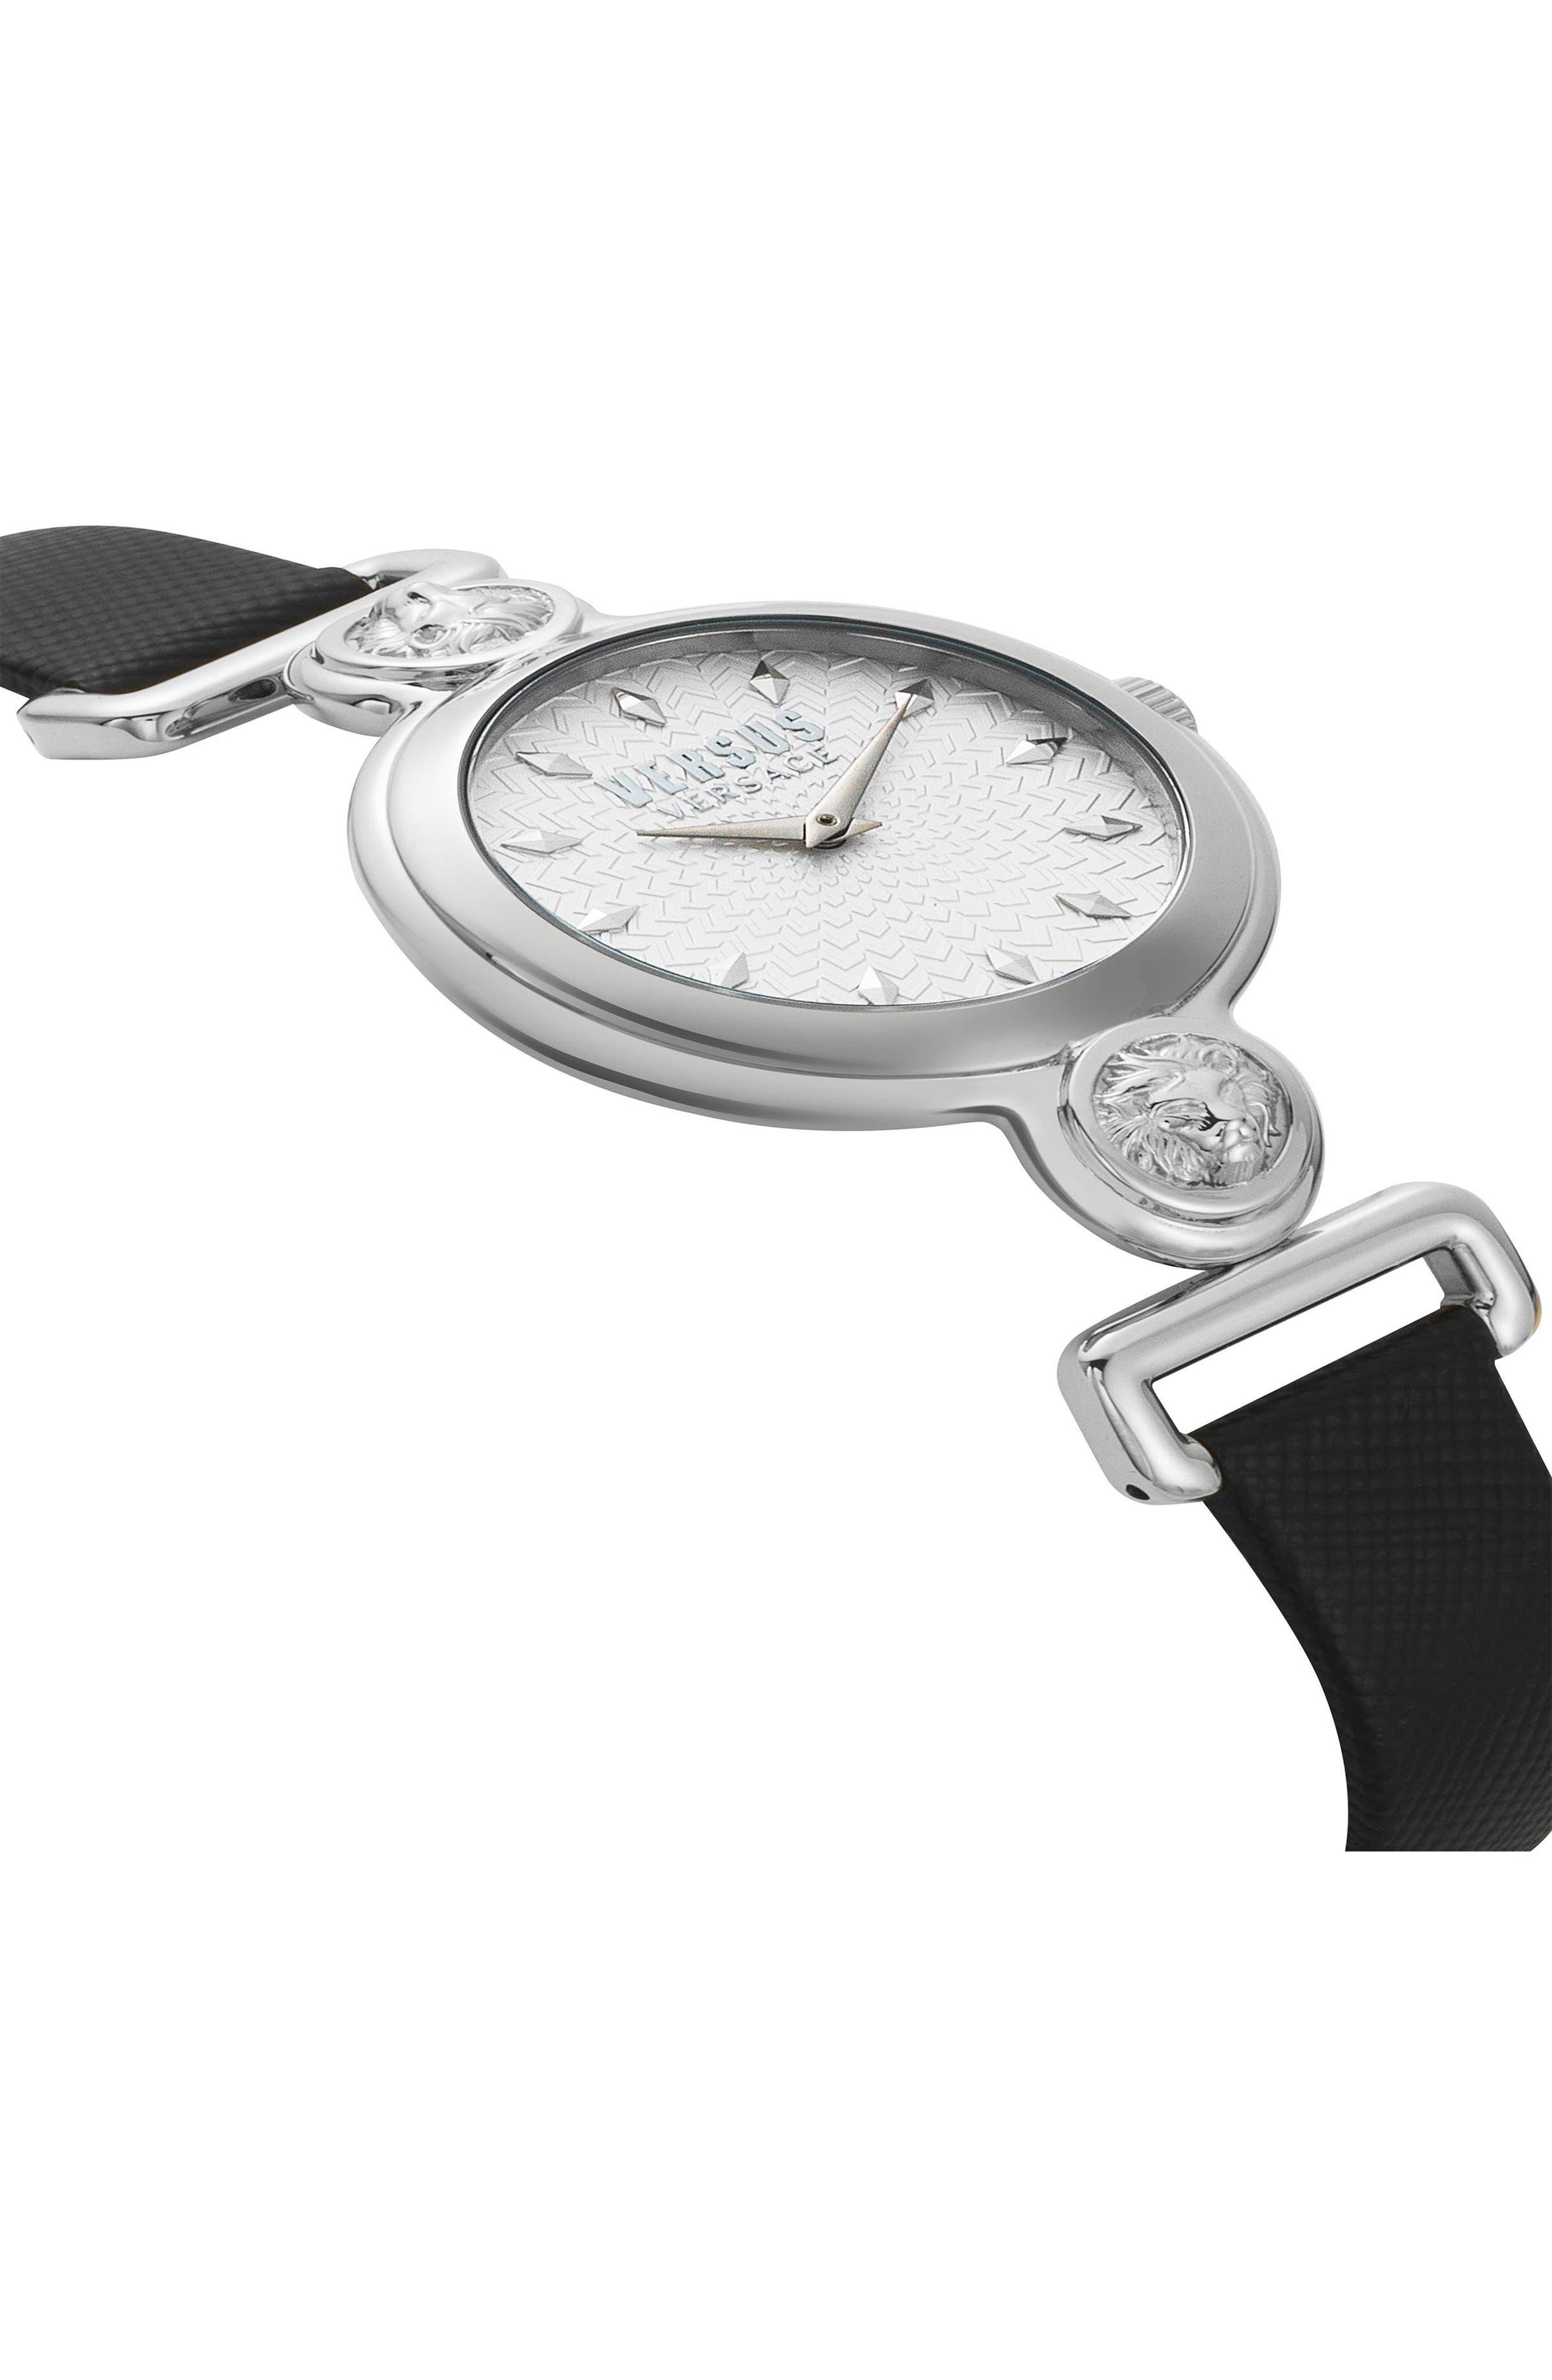 VERSUS VERSACE, Sunnyridge Leather Strap Watch, 34mm, Alternate thumbnail 3, color, 001